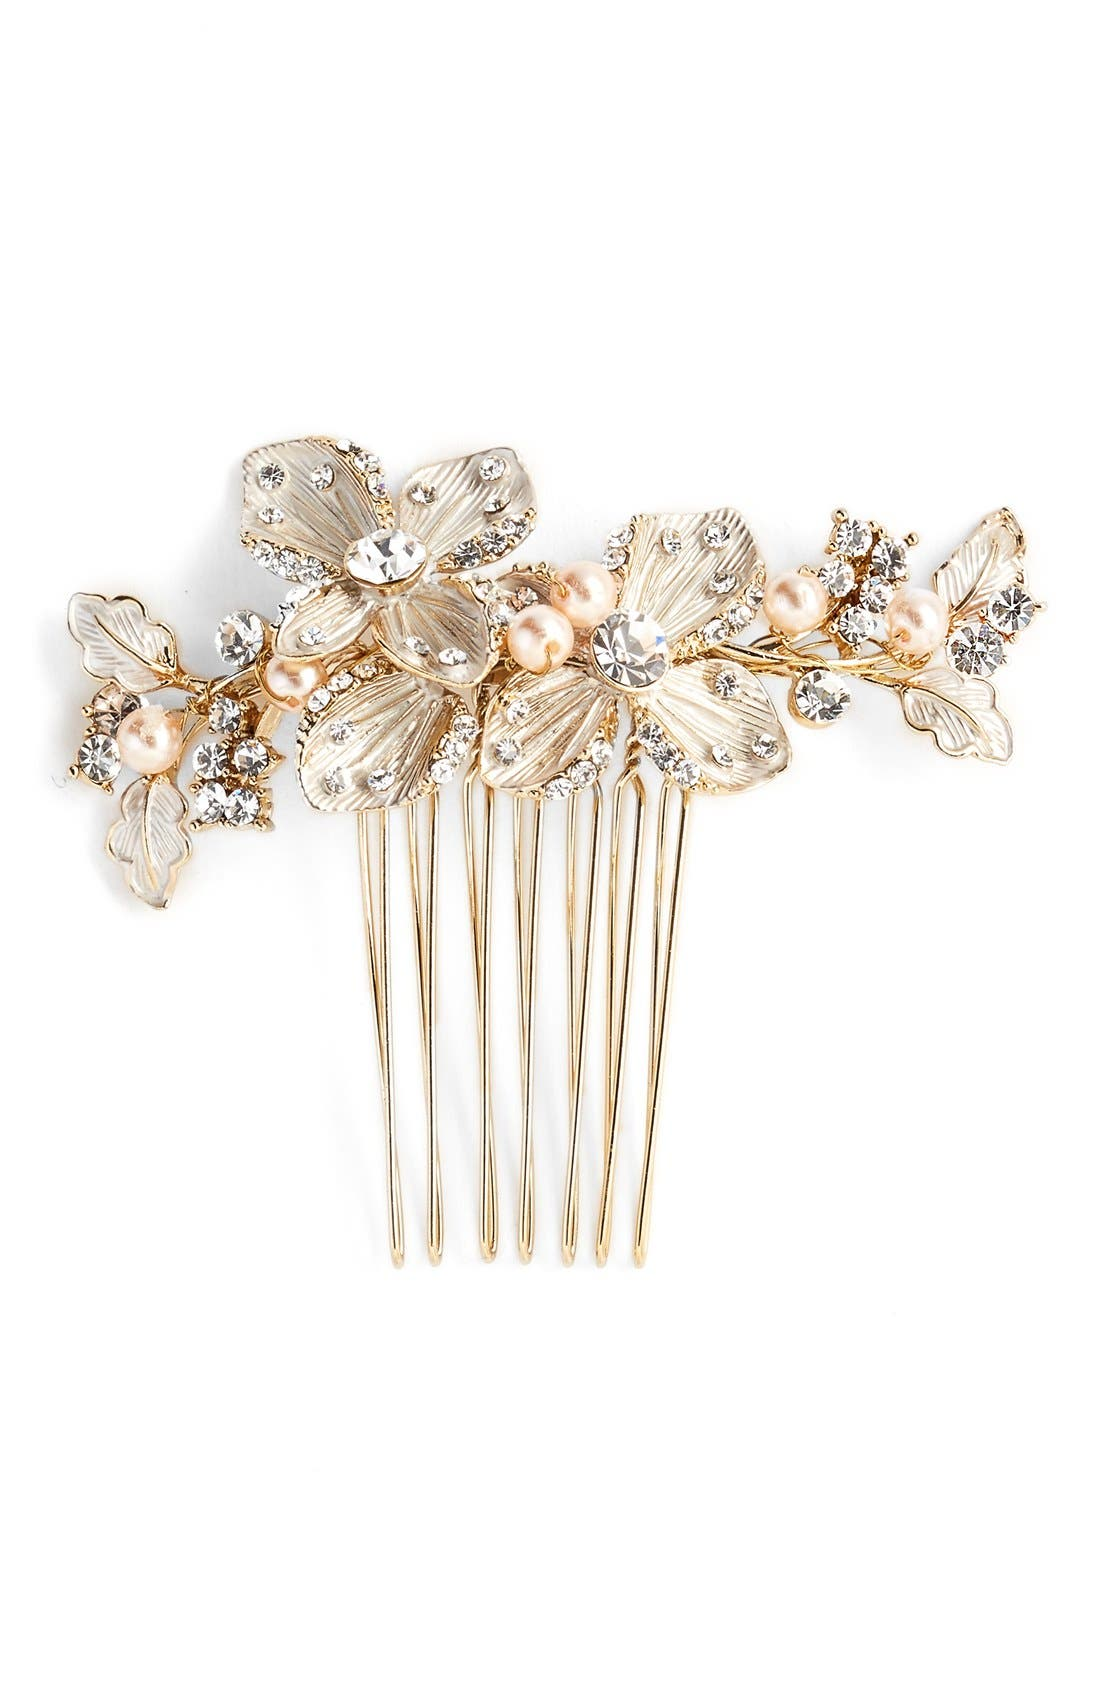 Main Image - Wedding Belles New York 'Petite Garden' Crystal Hair Comb